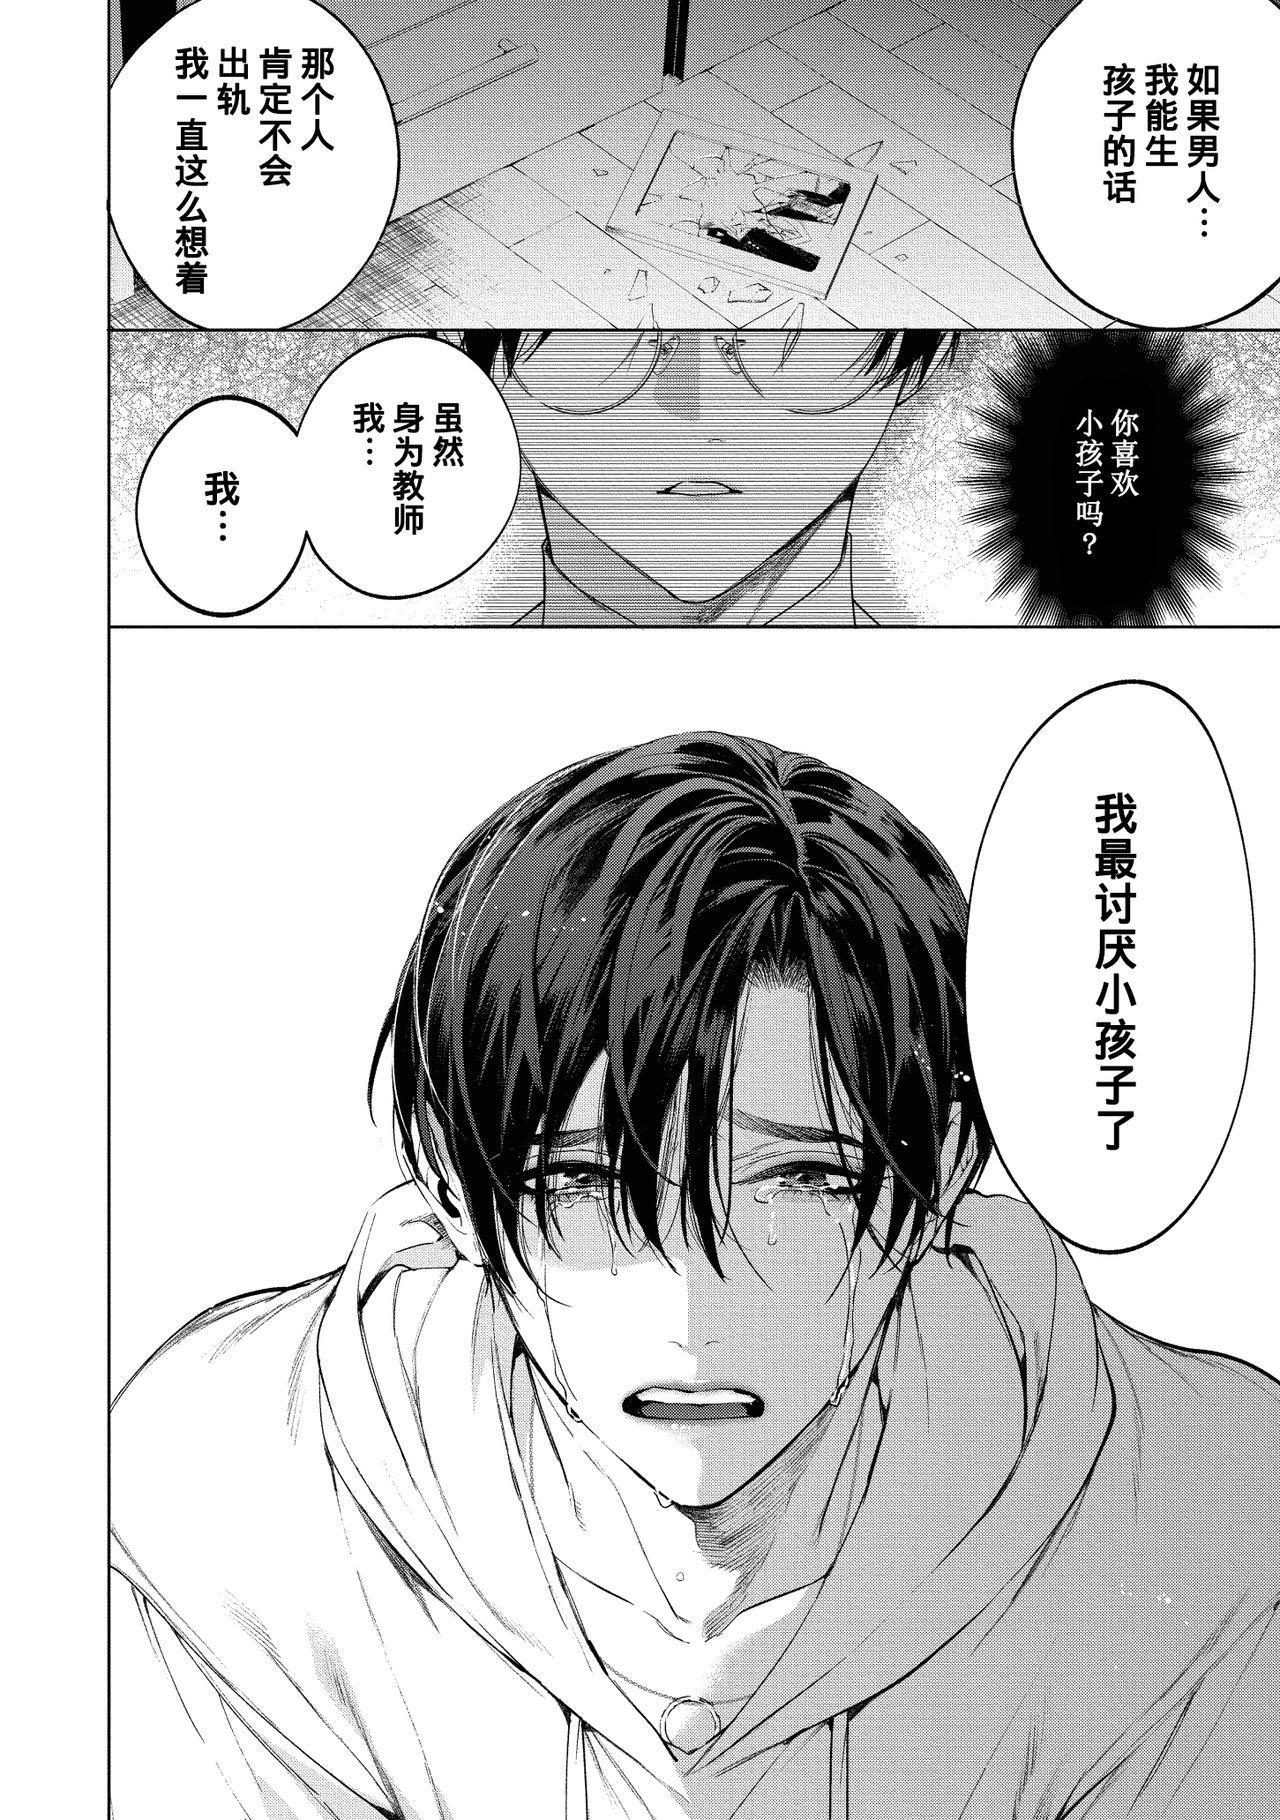 Sensei wa Benki ja Arimasen.3 | 老师不是便器。3 29